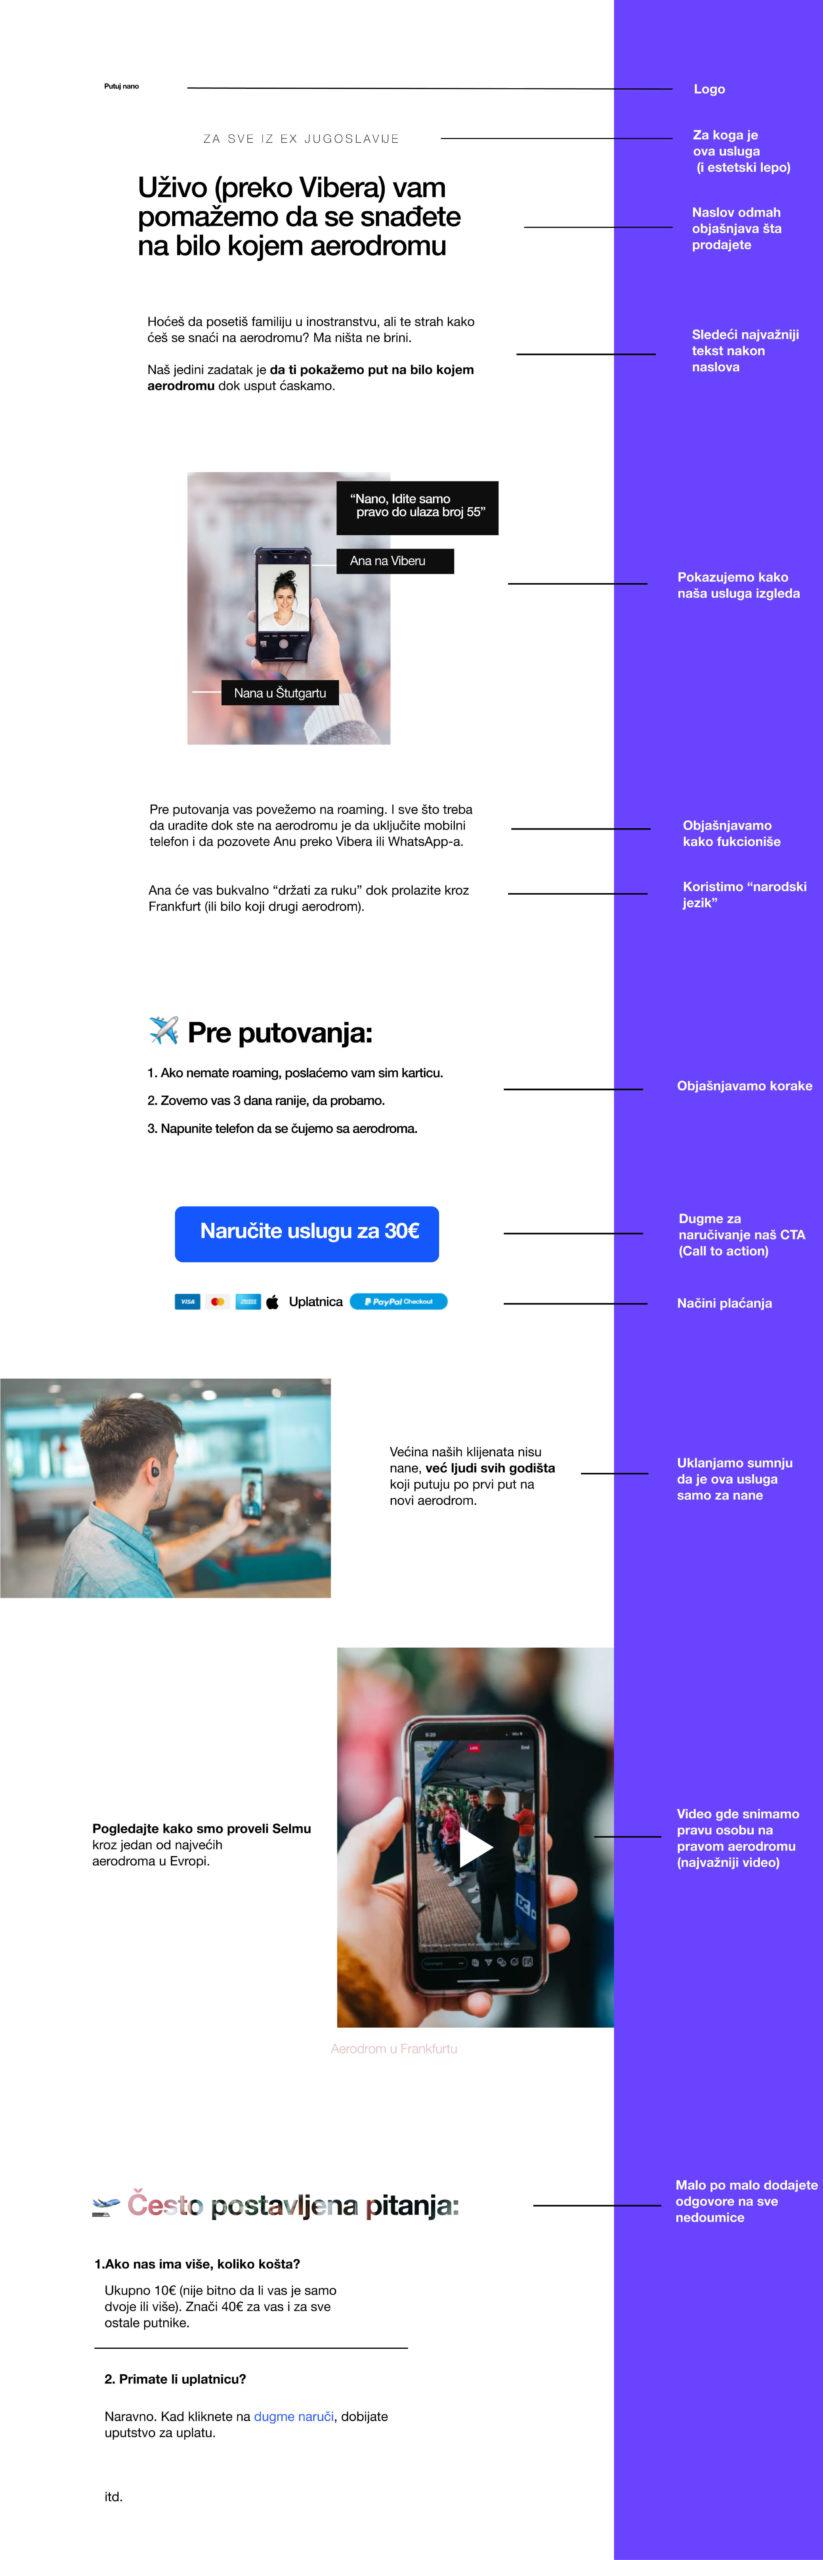 Kako pokrenuti biznis landing page dizajn